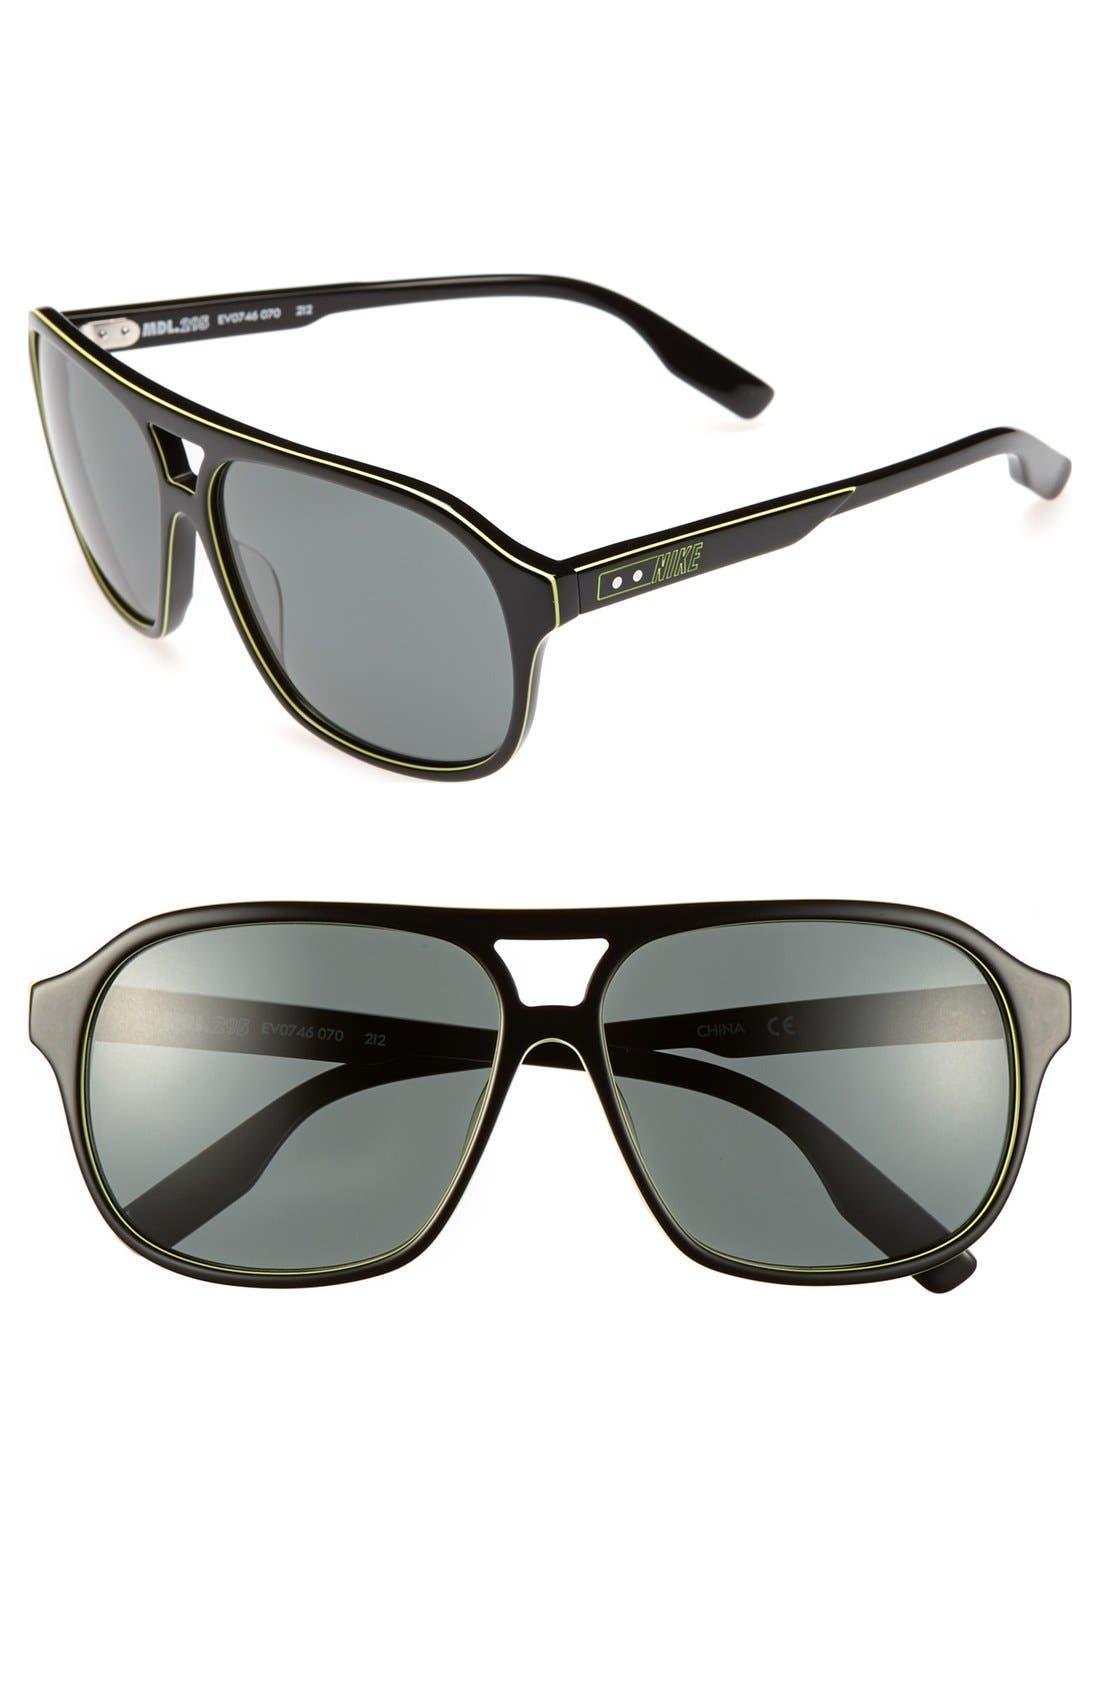 Main Image - Nike 'MDL.295' 59mm Sunglasses